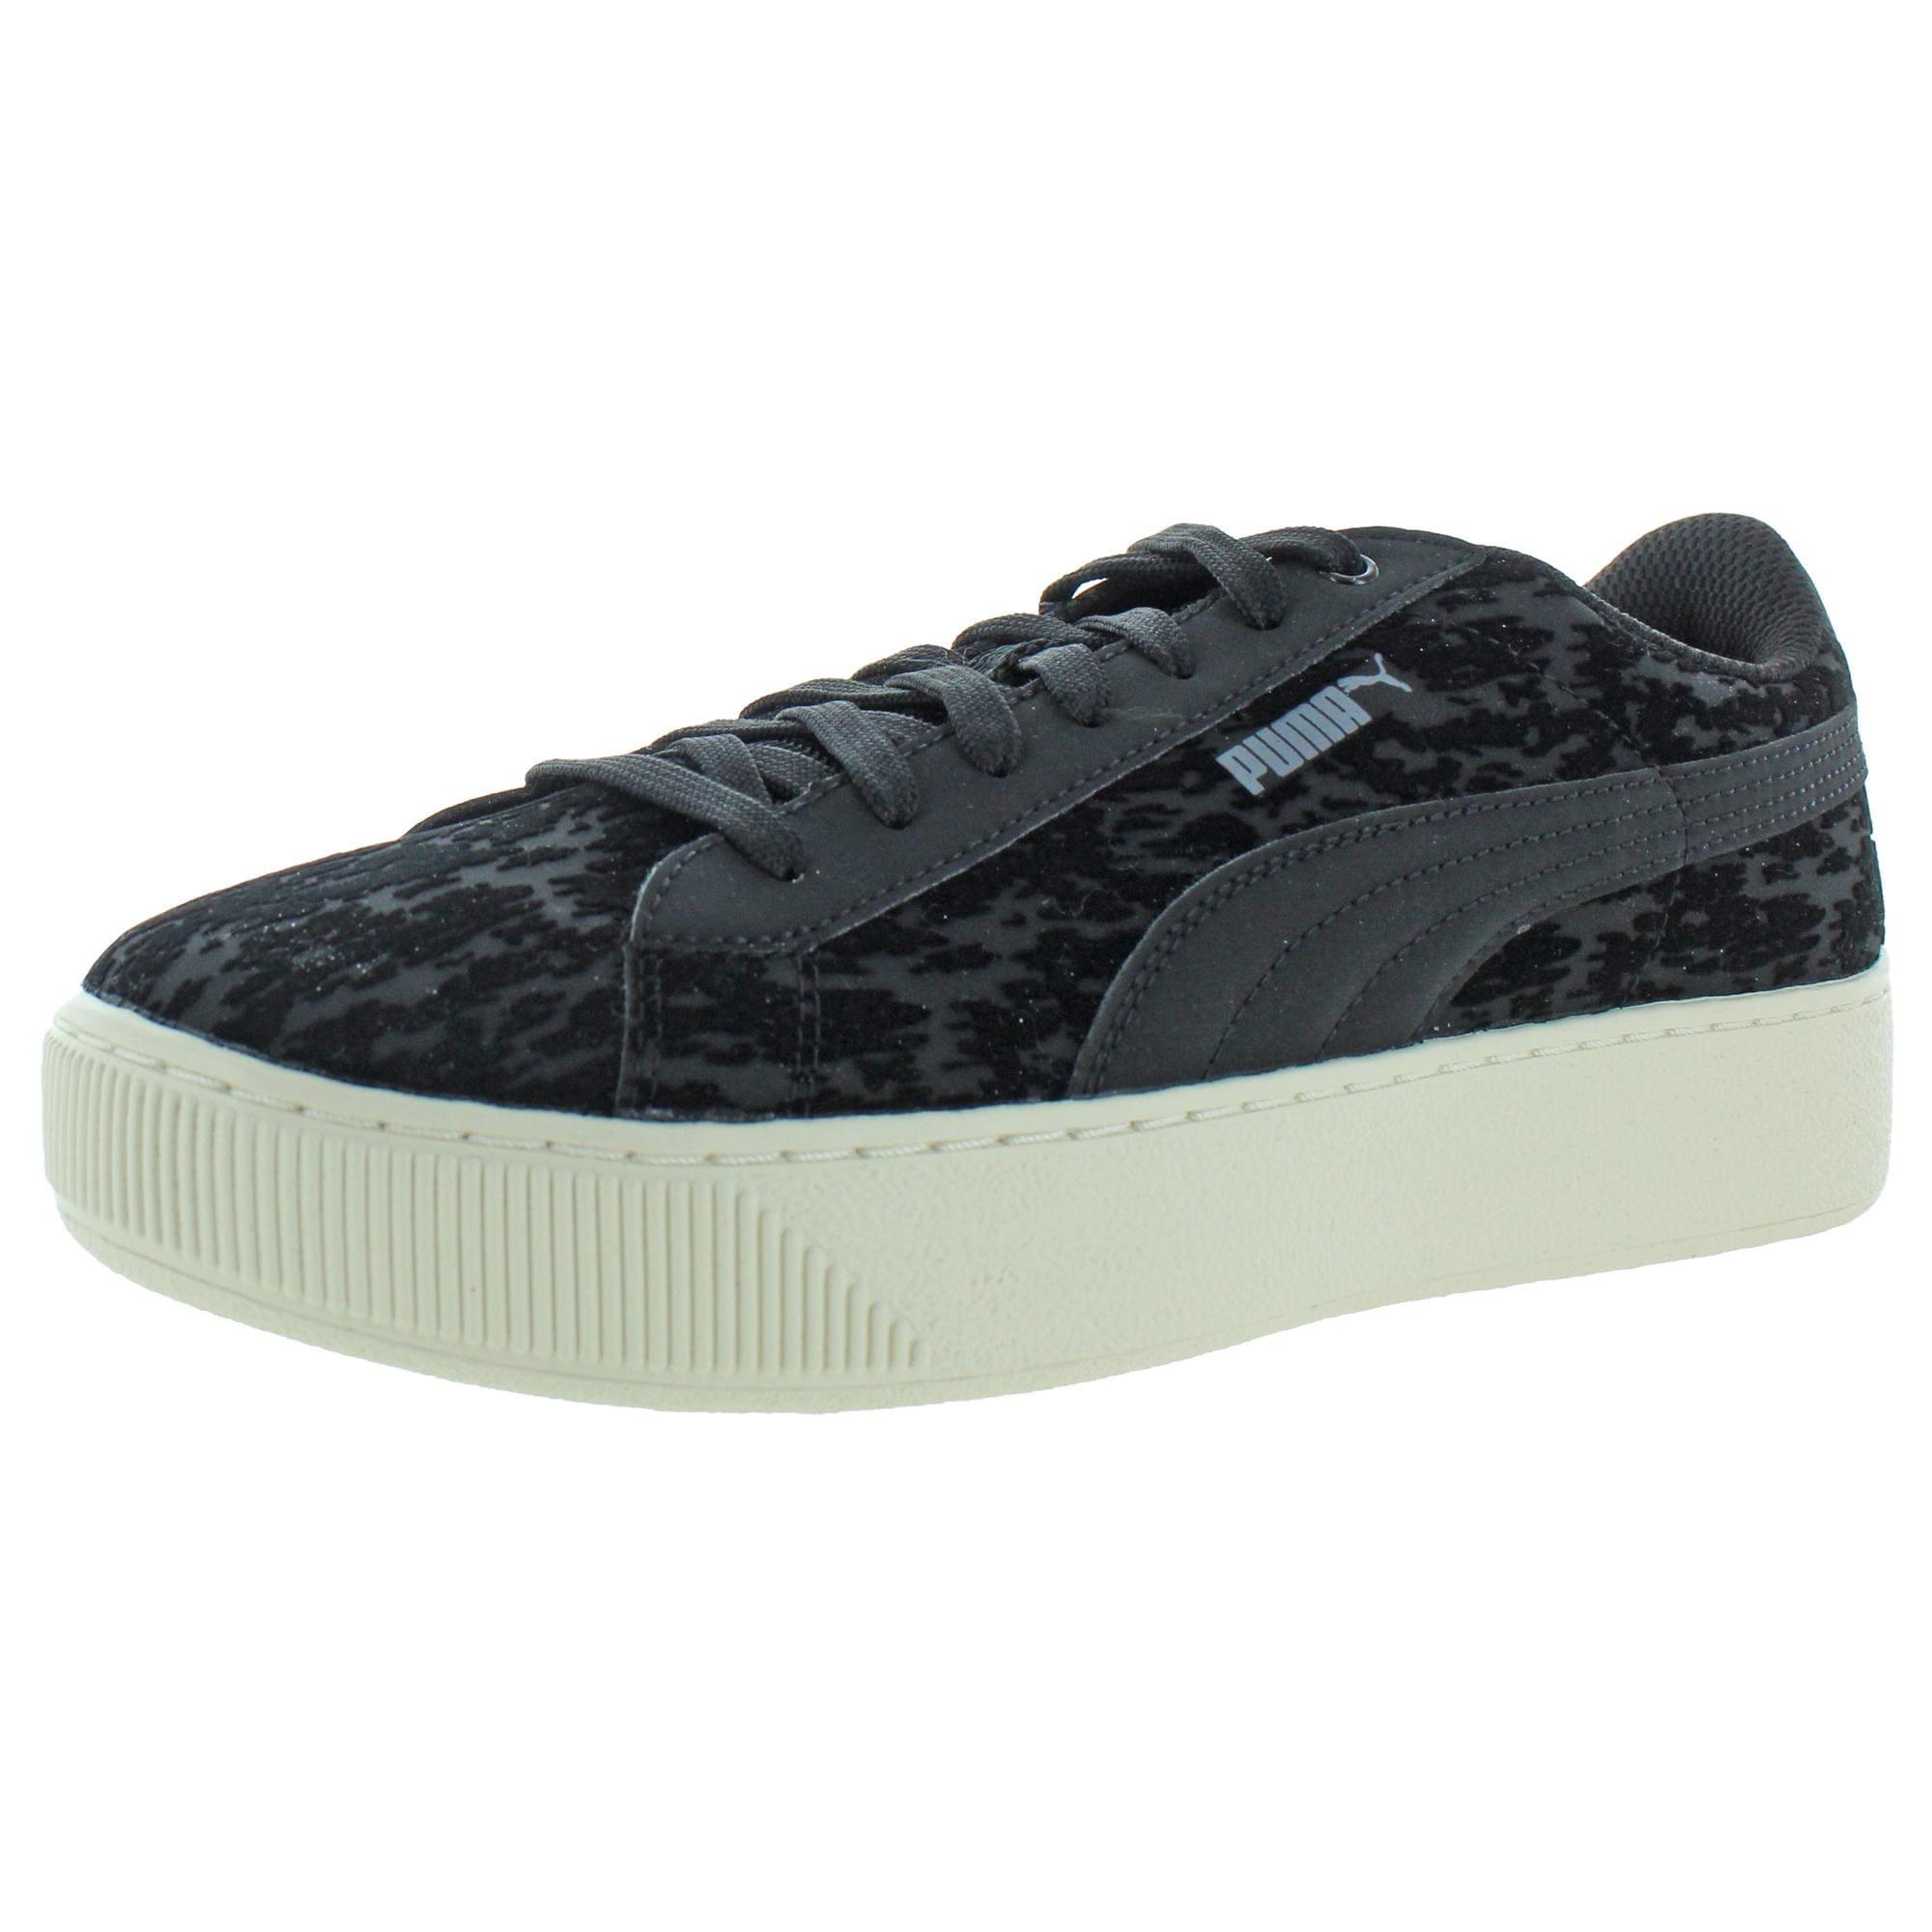 Shop Black Friday Deals on Puma Womens